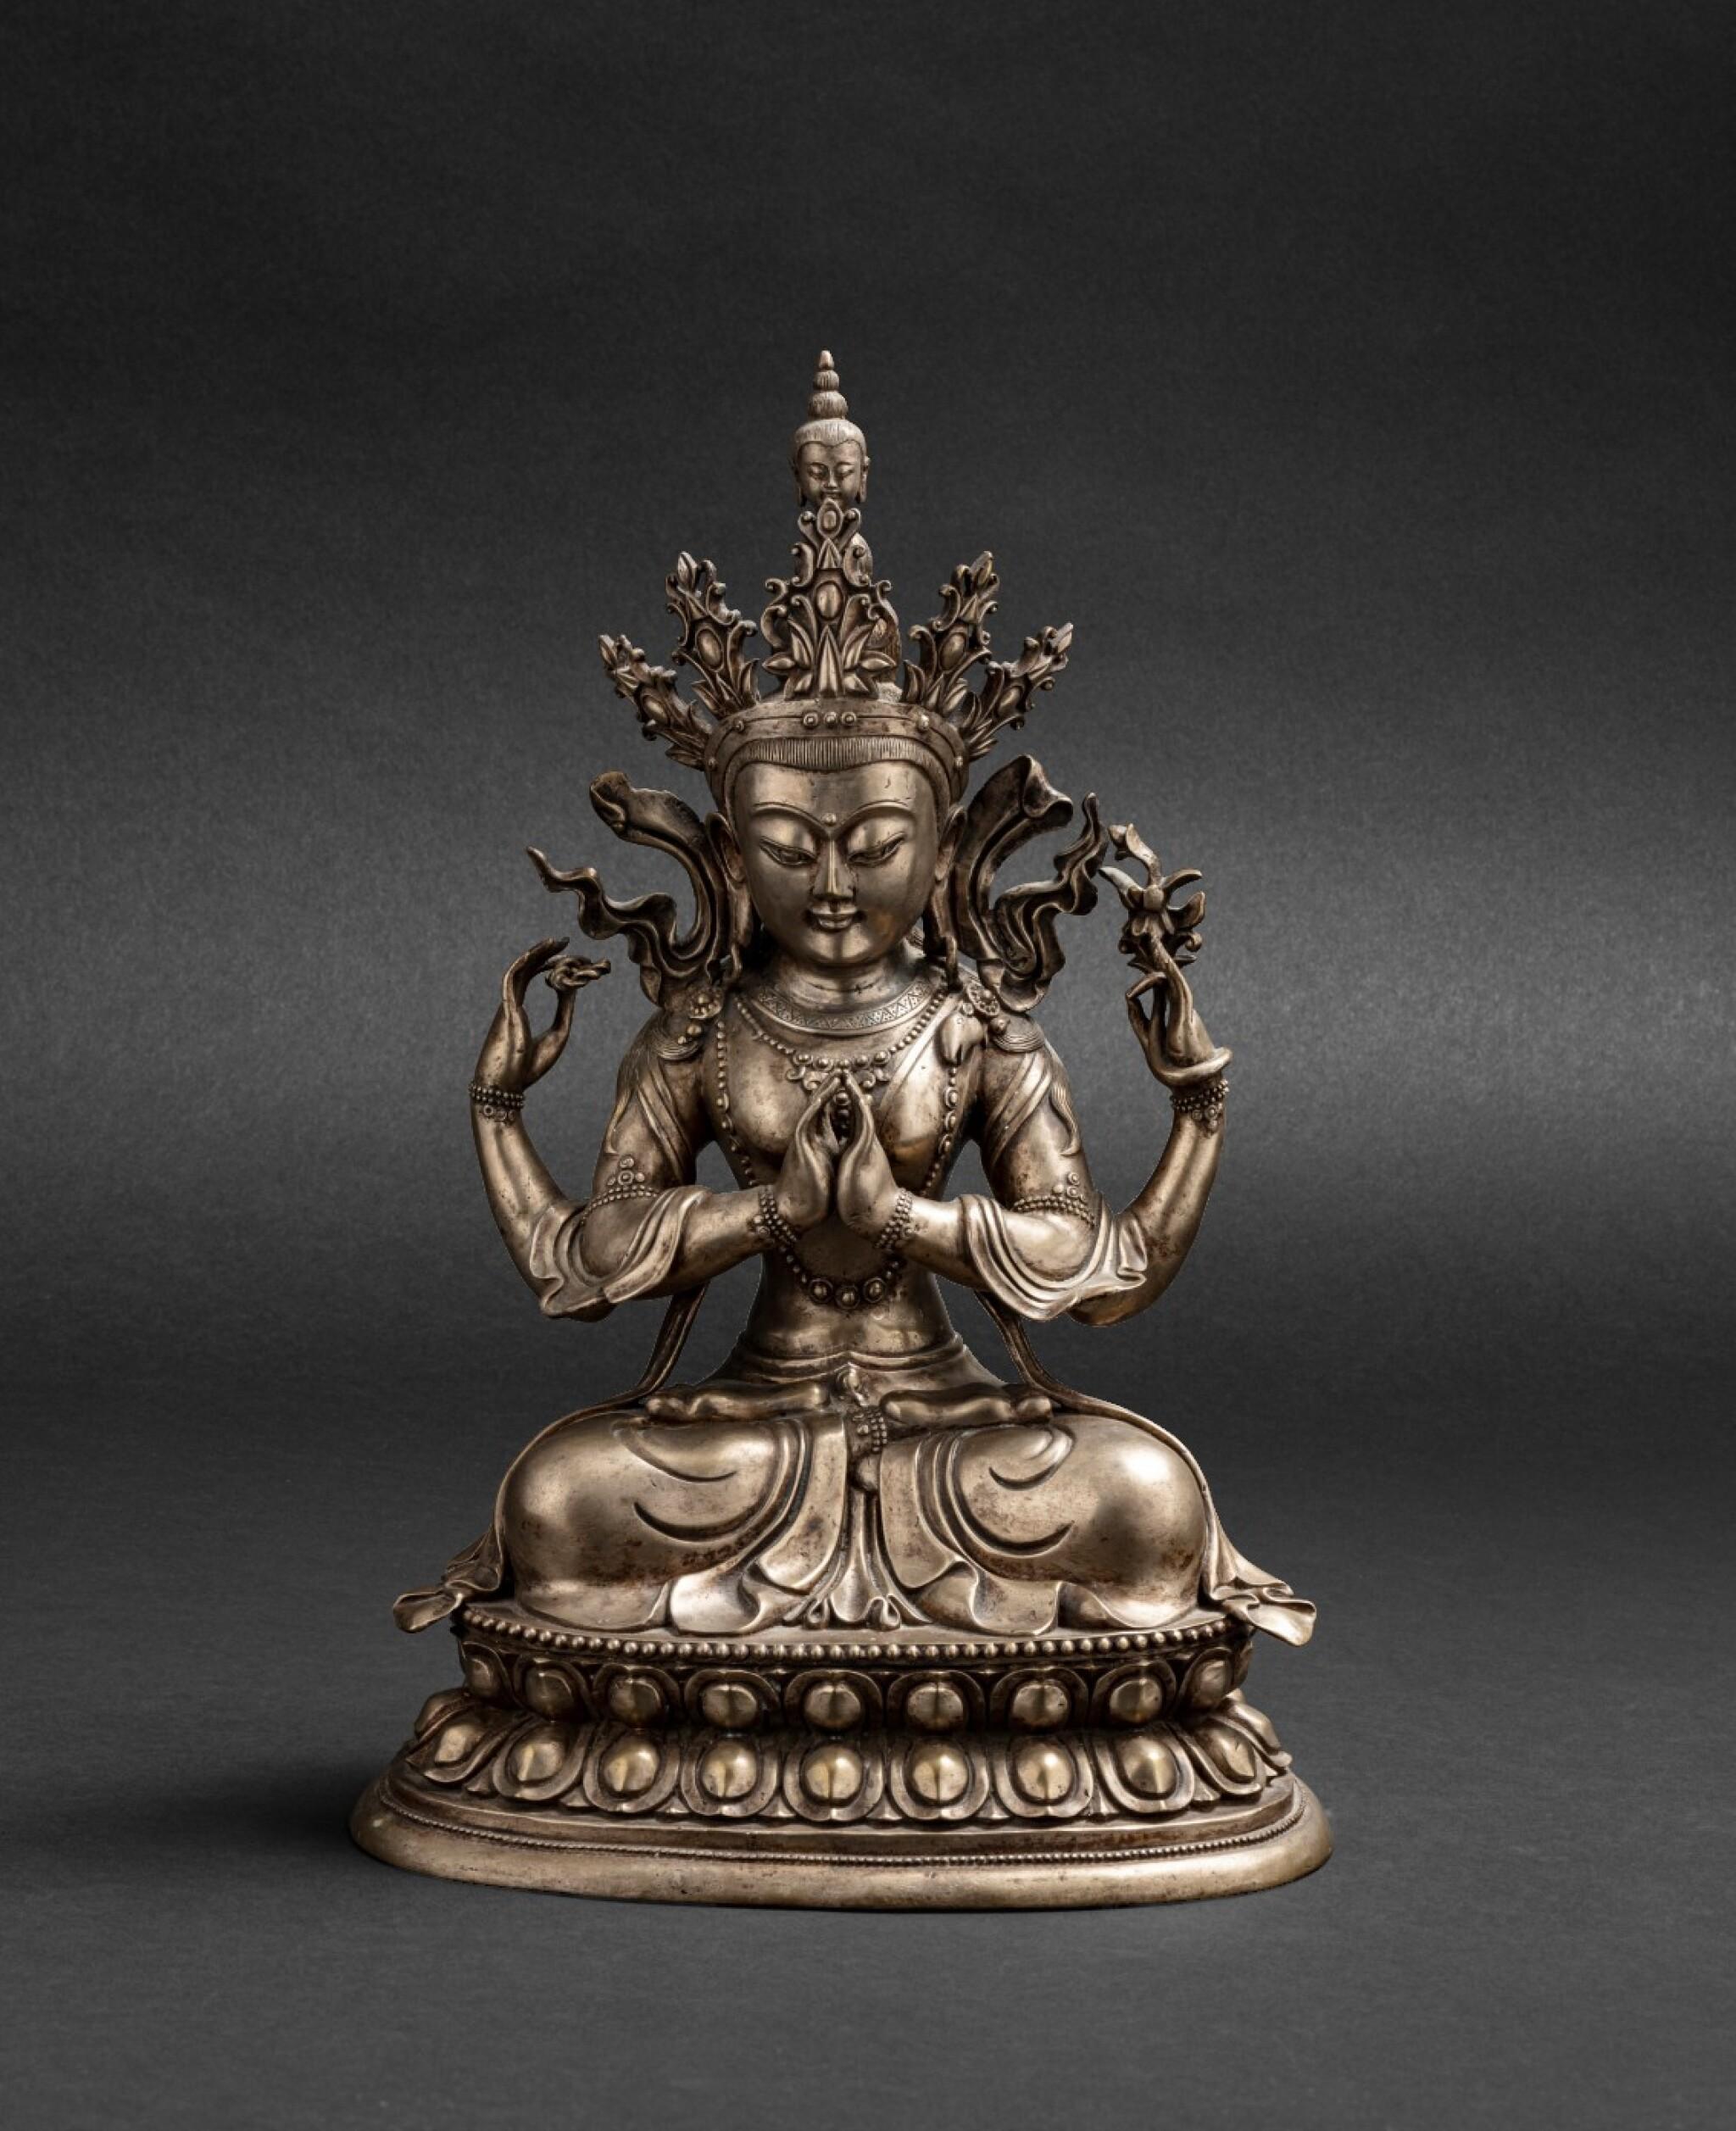 View 1 of Lot 56. Grande figure d'Avalokiteshvara en bronze argenté Circa 1900 | 約1900年 鎏銀銅觀世音菩薩座像 | A silvered-bronze figure of Avalokiteshvara, ca. 1900.